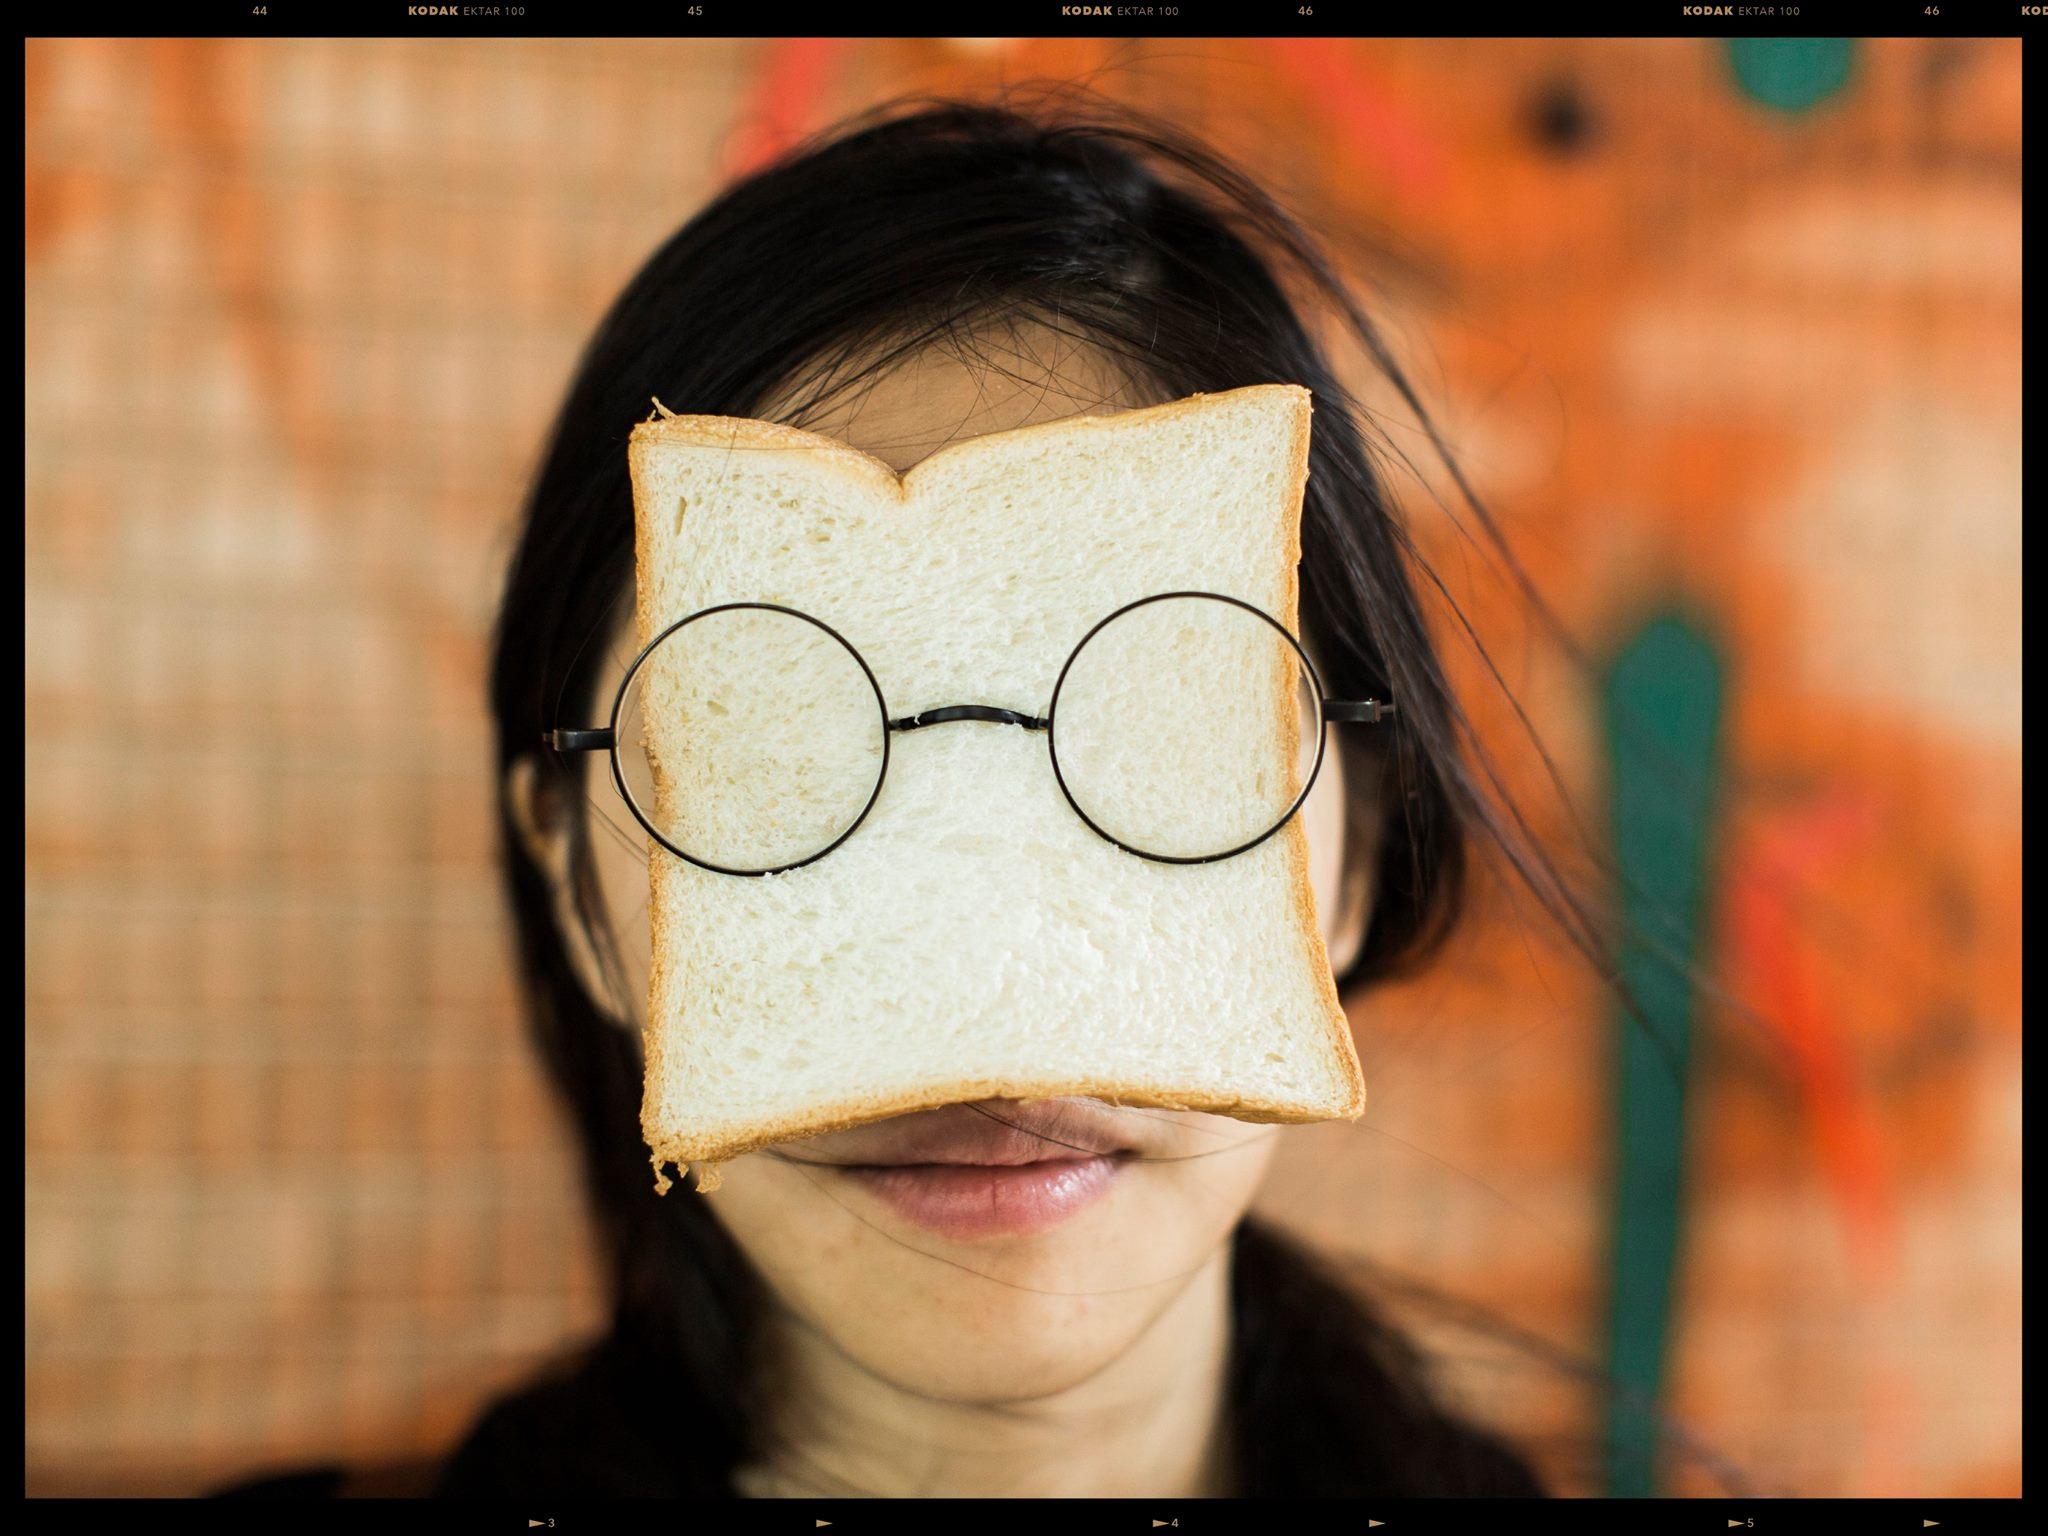 Toast_wuzphotography_7.jpg